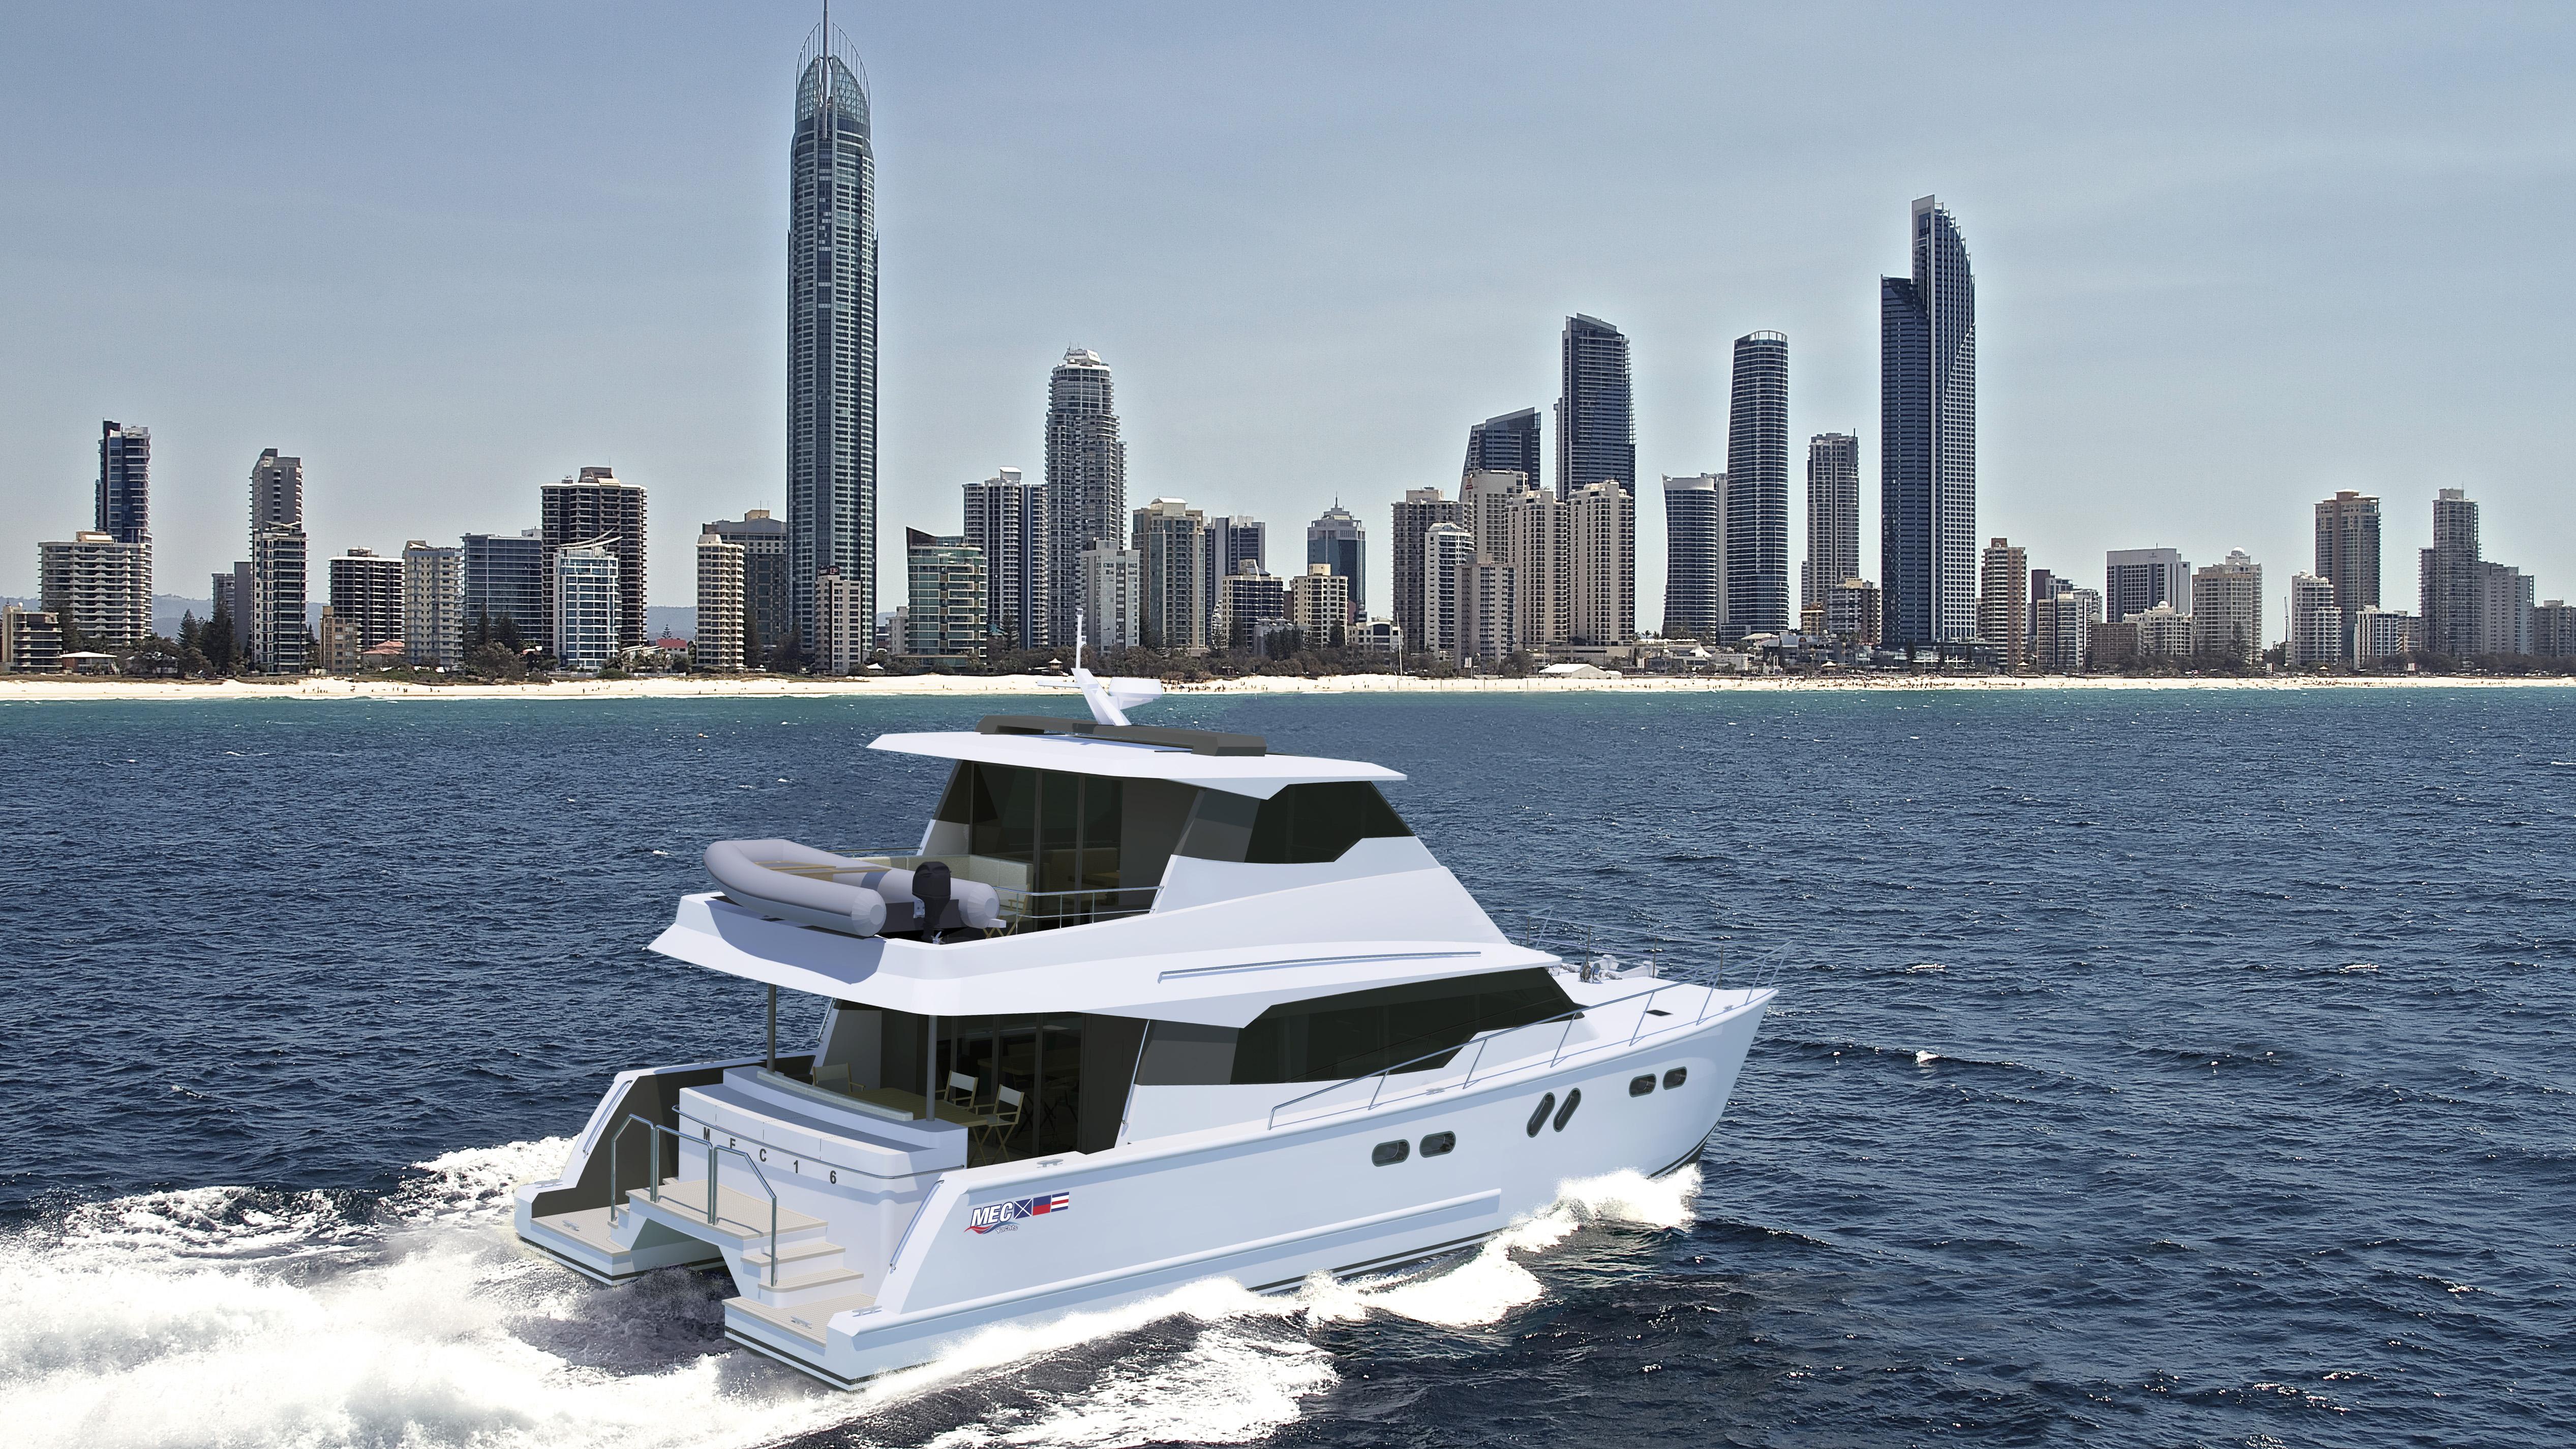 16.75m Starboard Quarter